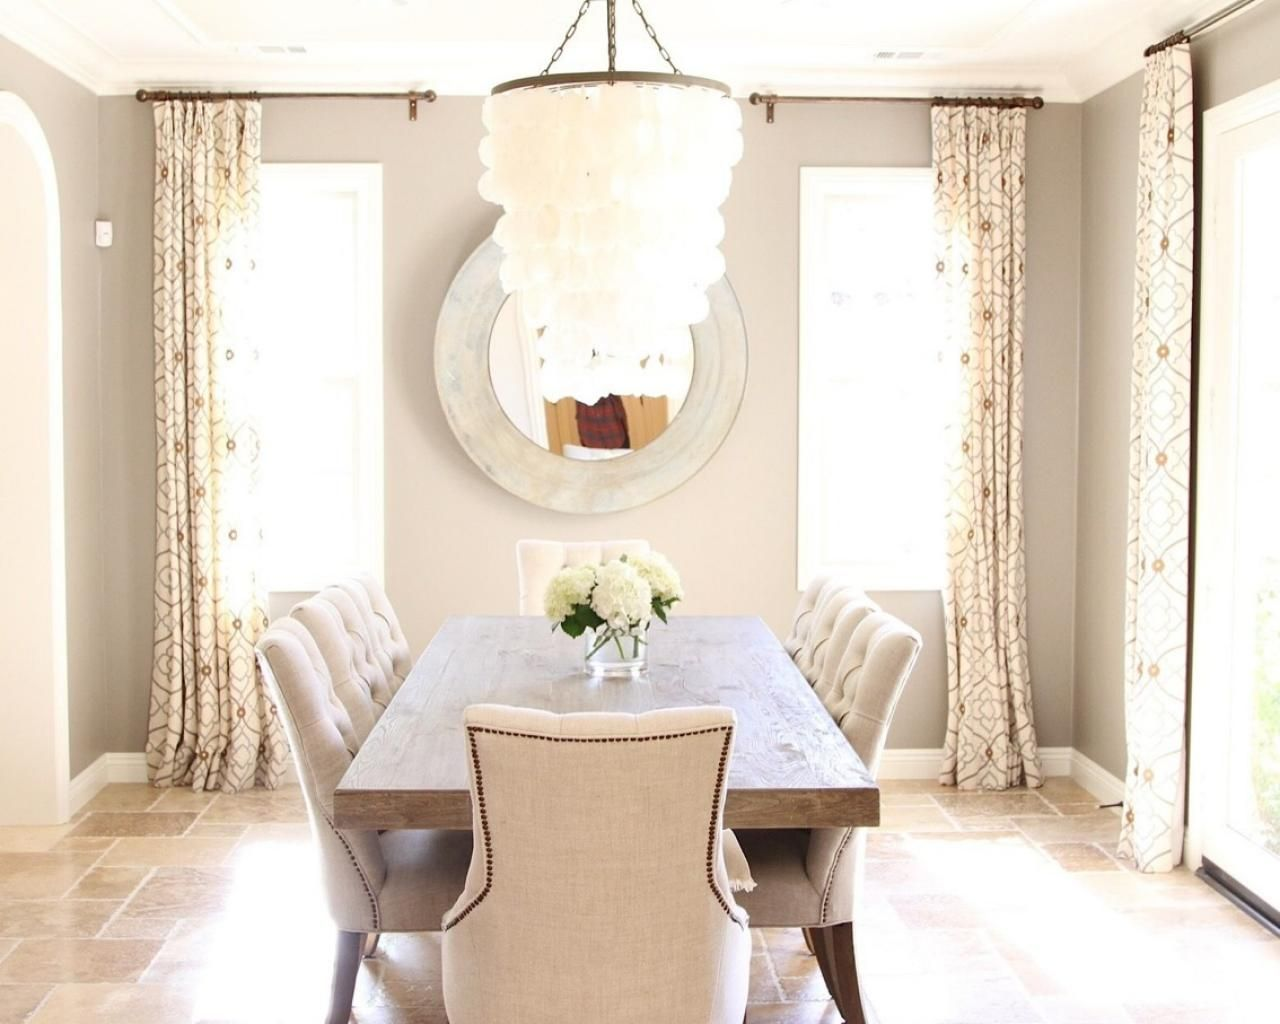 Elegant Dining Room Chandeliers Fascinating 10 Dining Room Chandeliers For Every Design Style  Formal Dining 2018